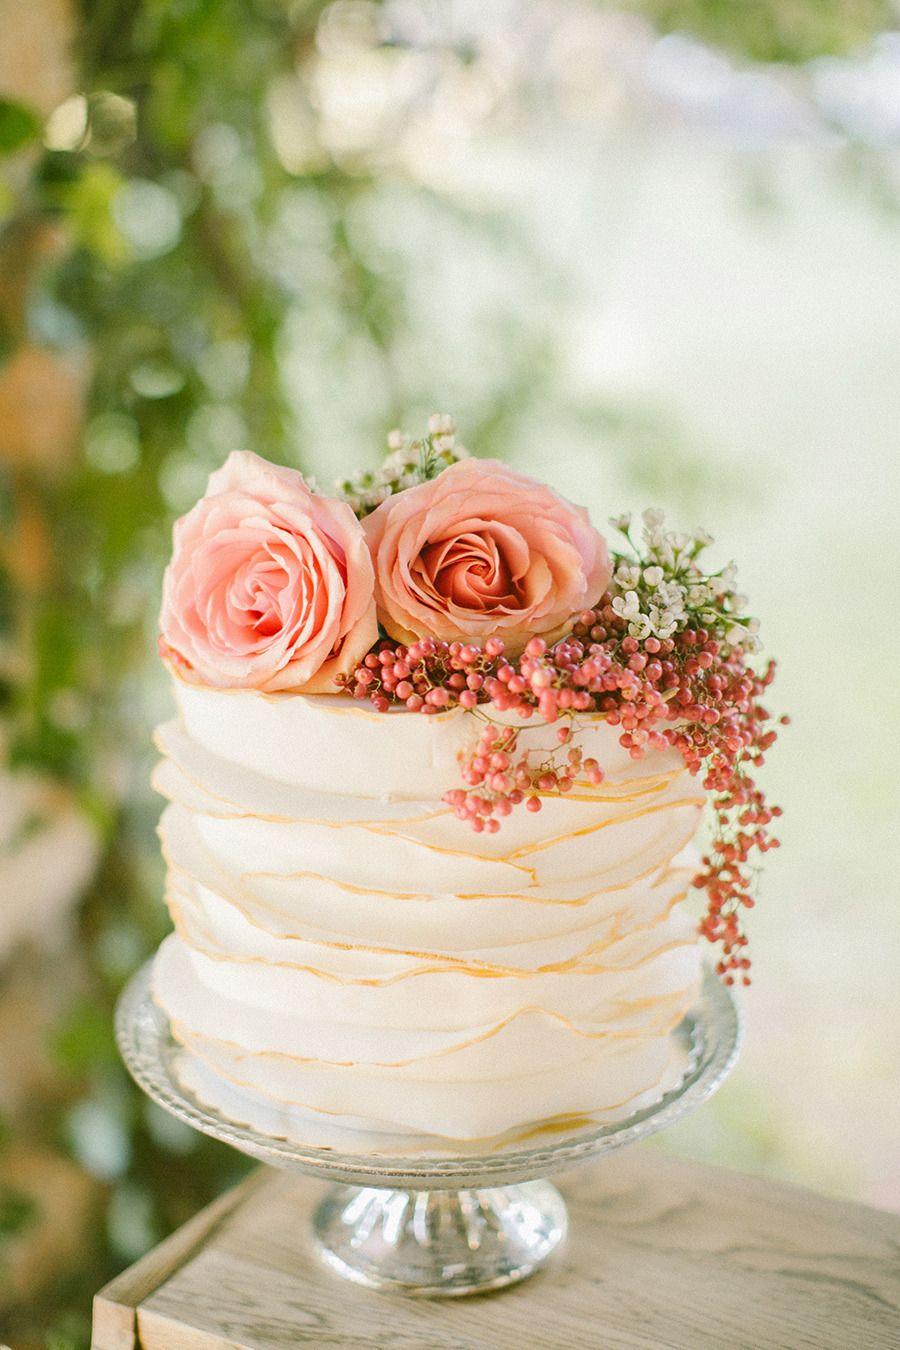 Photography: Anna Roussos Photography - annaroussos.com  Read More: http://www.stylemepretty.com/destination-weddings/2014/12/22/boho-chic-winter-wedding-inspiration/